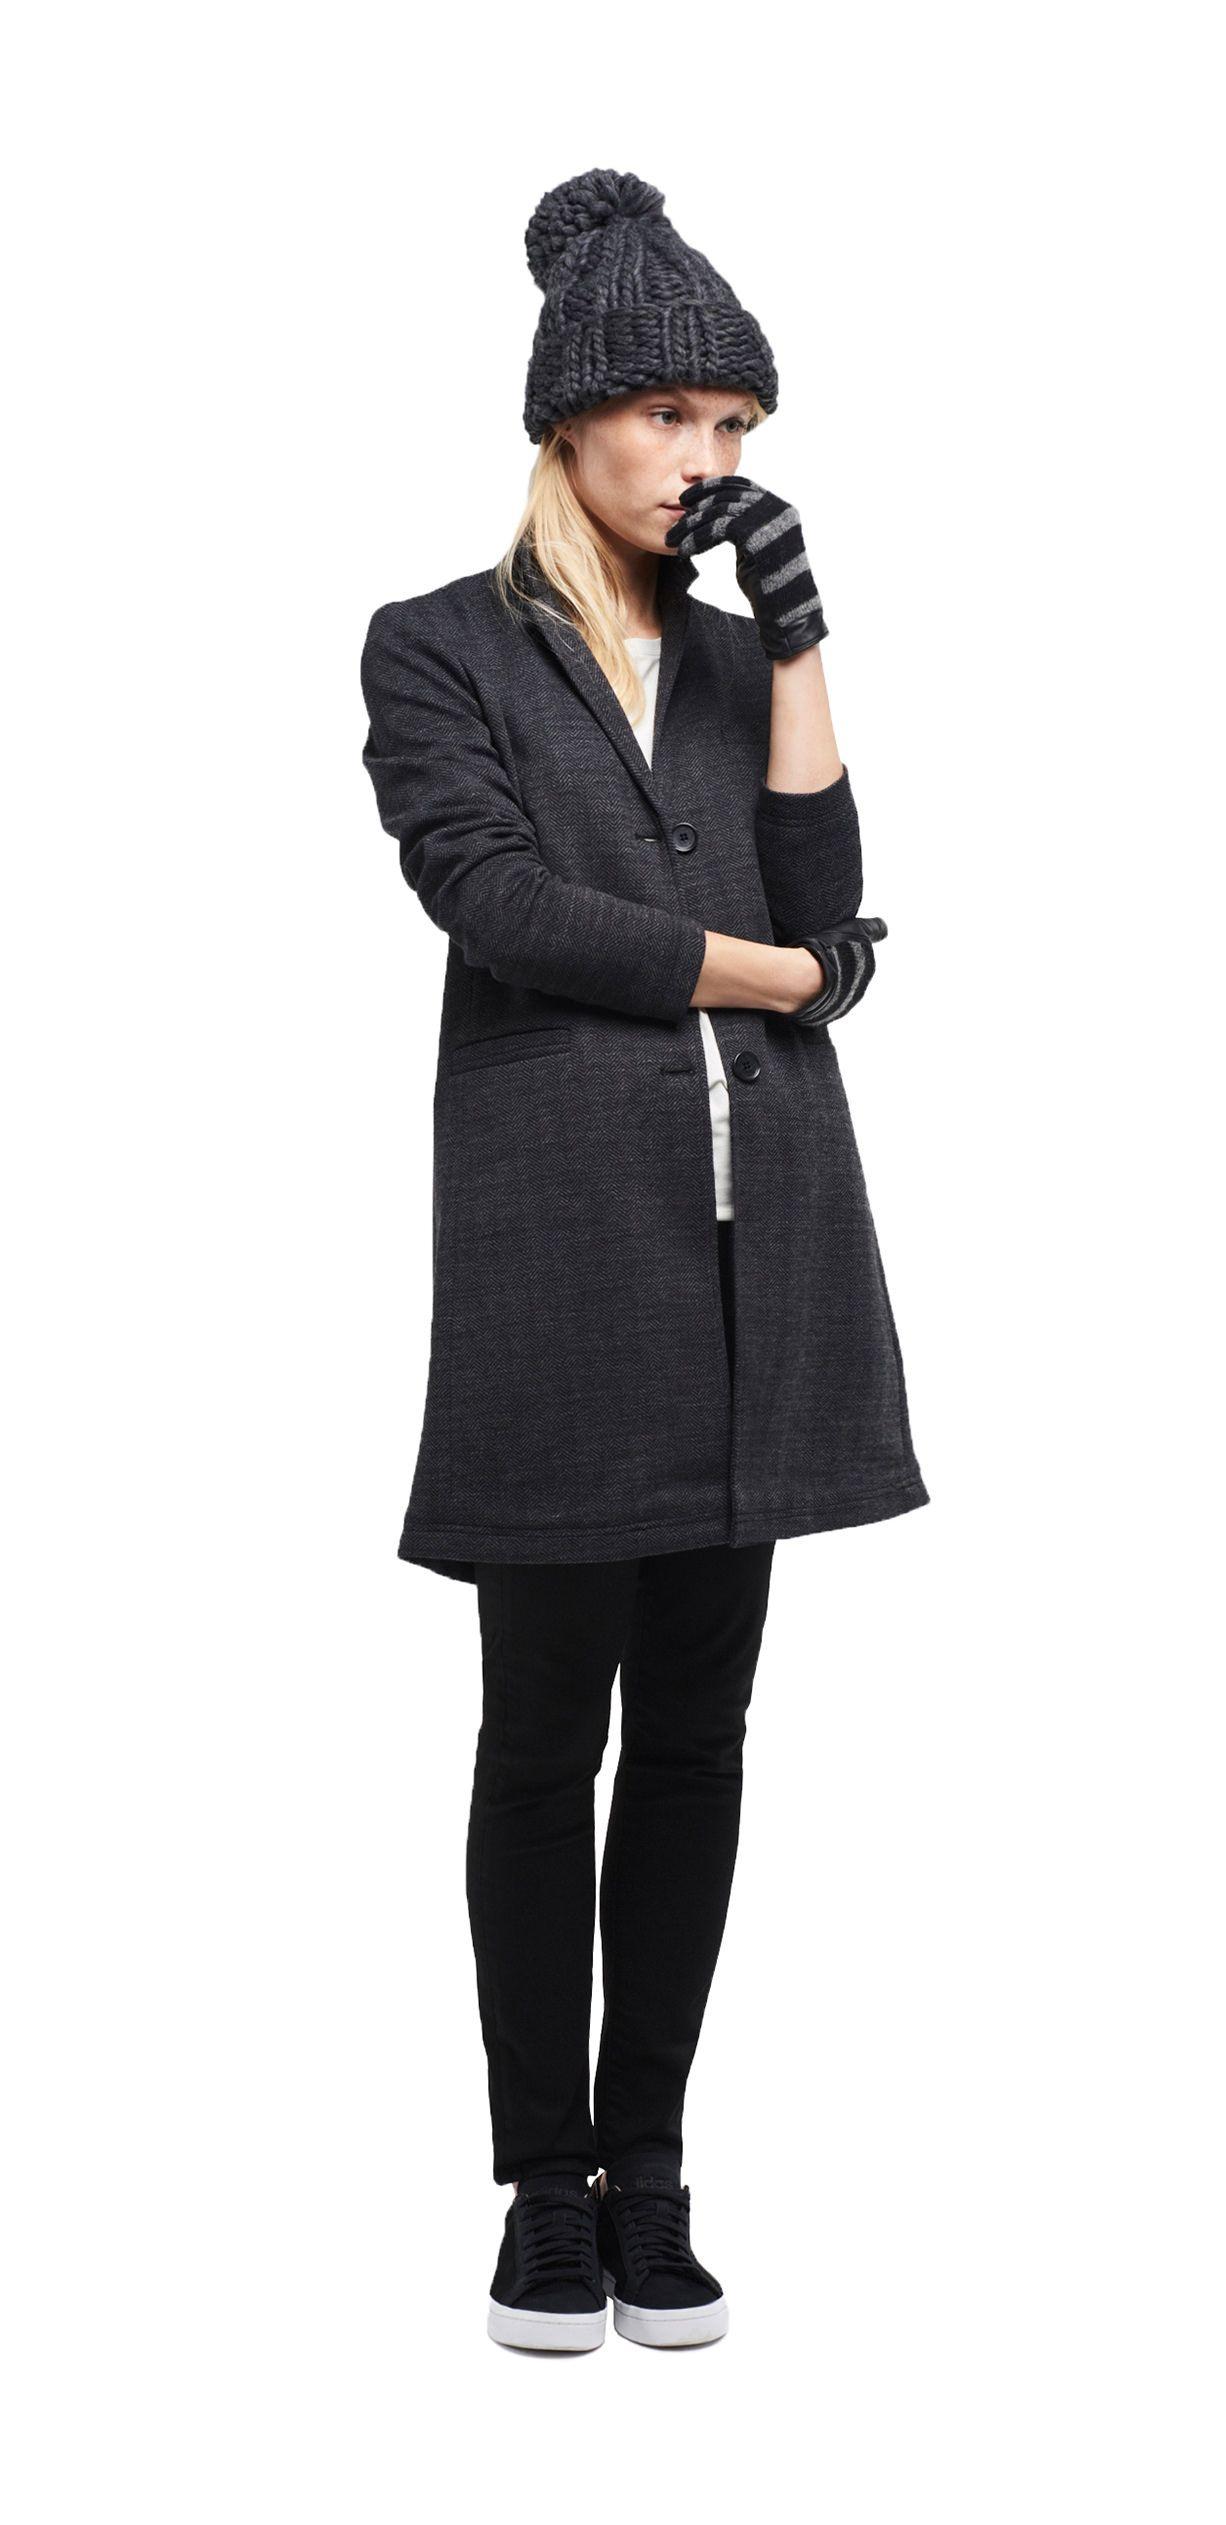 damen outfit dandy allure von opus fashion graue m tze graue handschuhe wei e let 39 s get. Black Bedroom Furniture Sets. Home Design Ideas